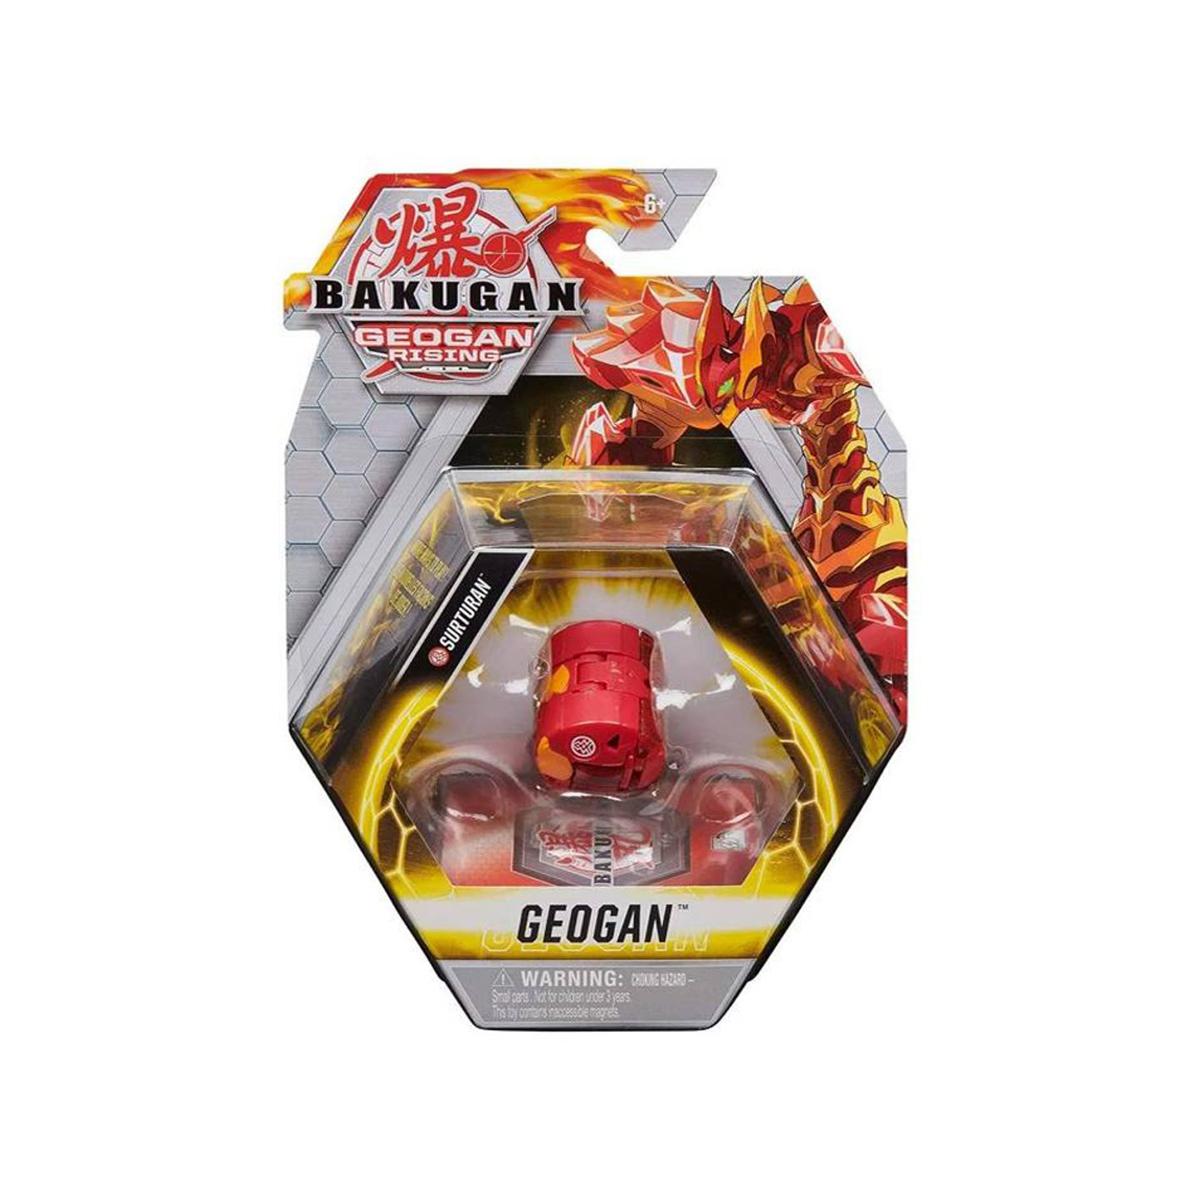 Figurina Surturan, Bakugan, Geogan Rising, 20129004